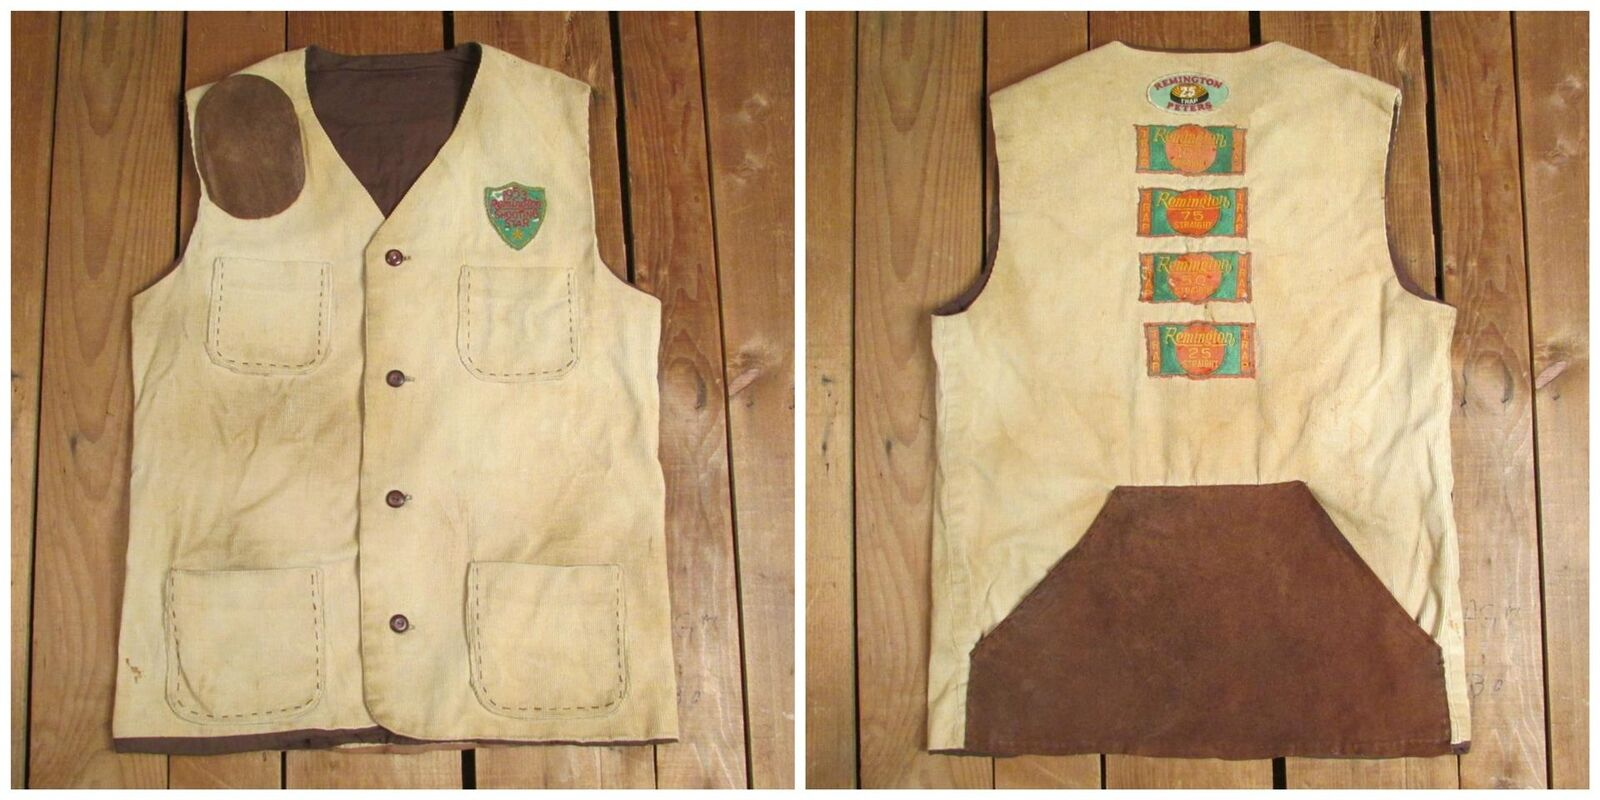 Vintage 1950s Trap Shooting Corduroy Leather Vest Remington Award Patches Peters